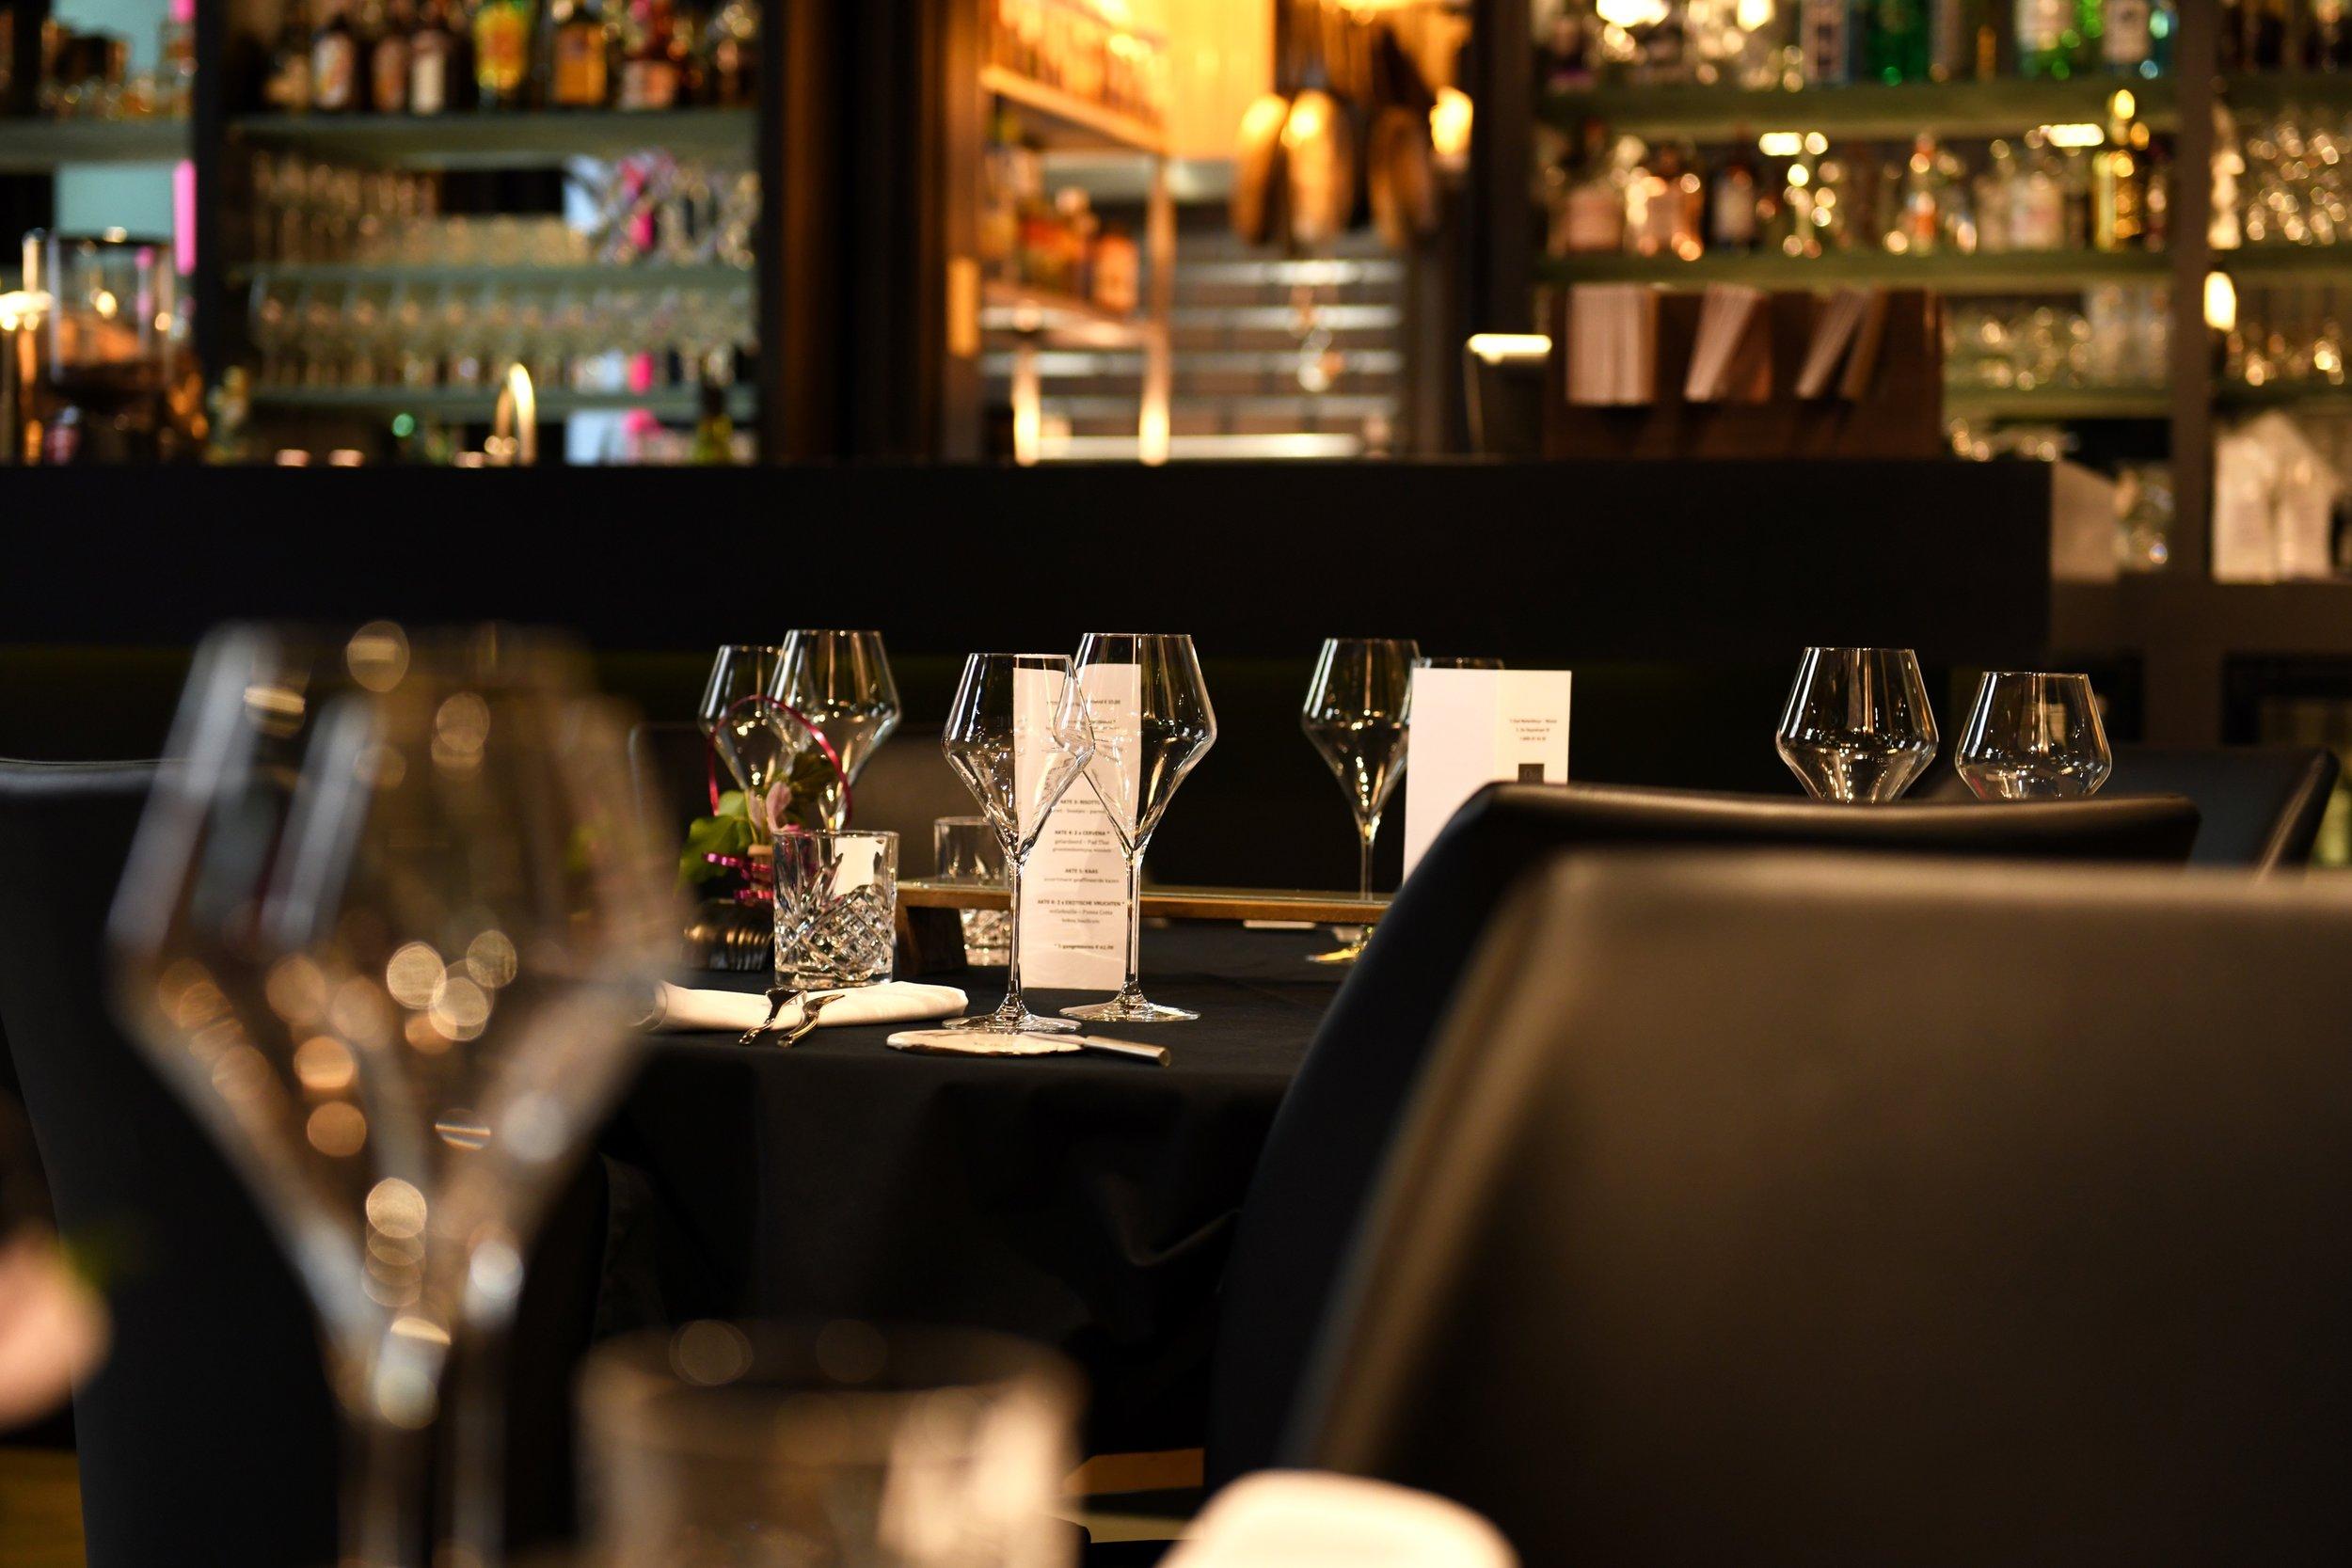 5 restaurant brasserie oud notarishuis ninove bart albrecht tablefever .jpg